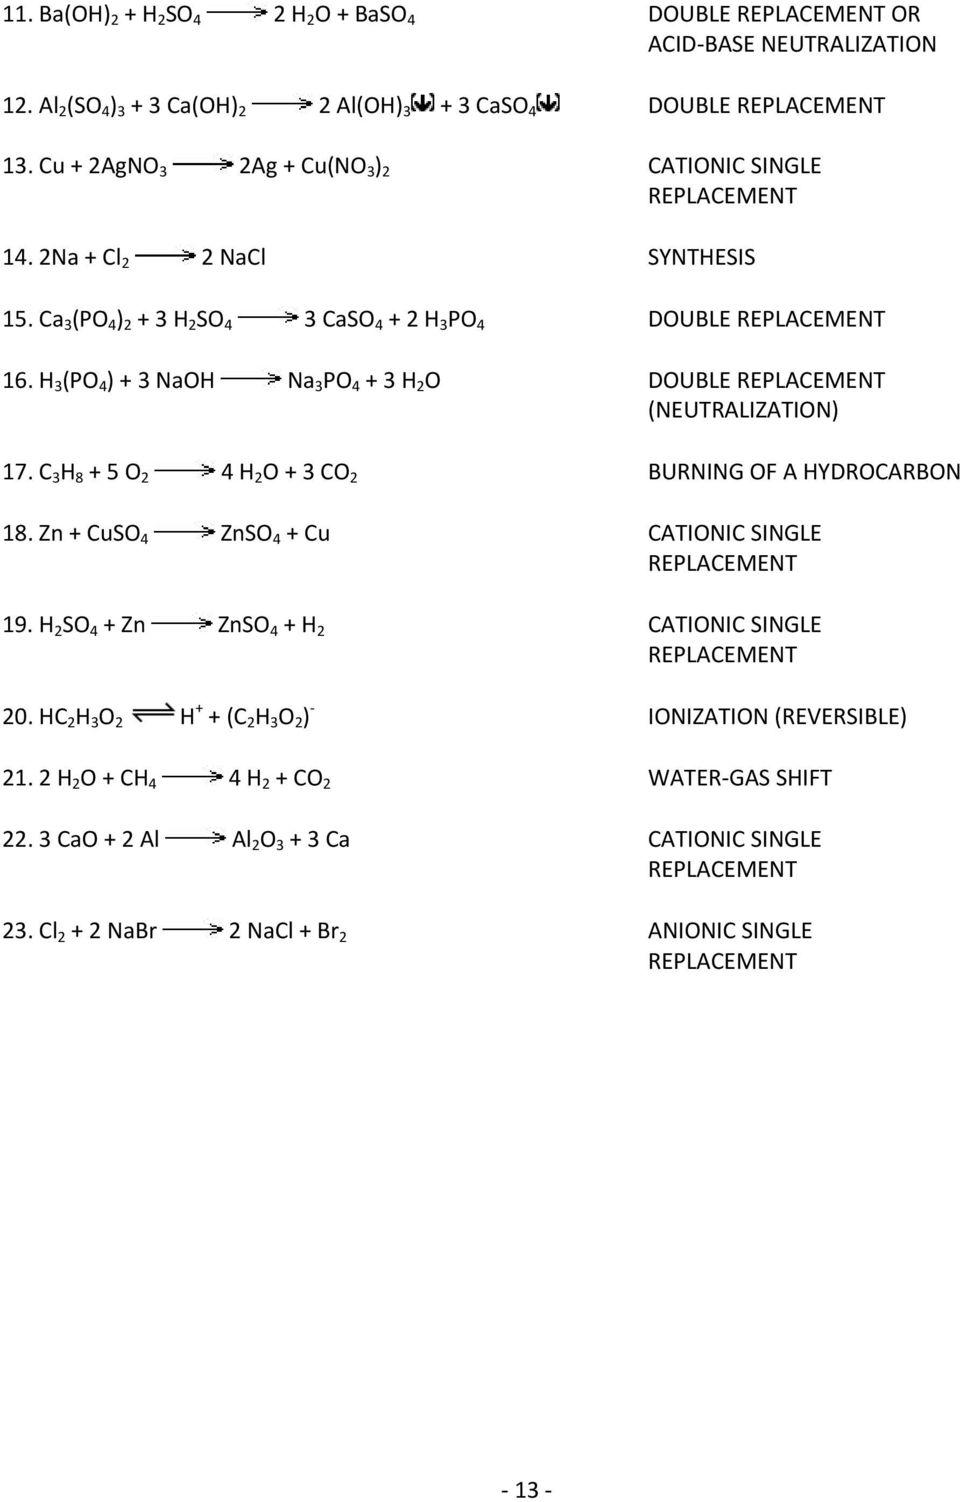 hight resolution of h 3 po 4 3 naoh na 3 po 4 3 h